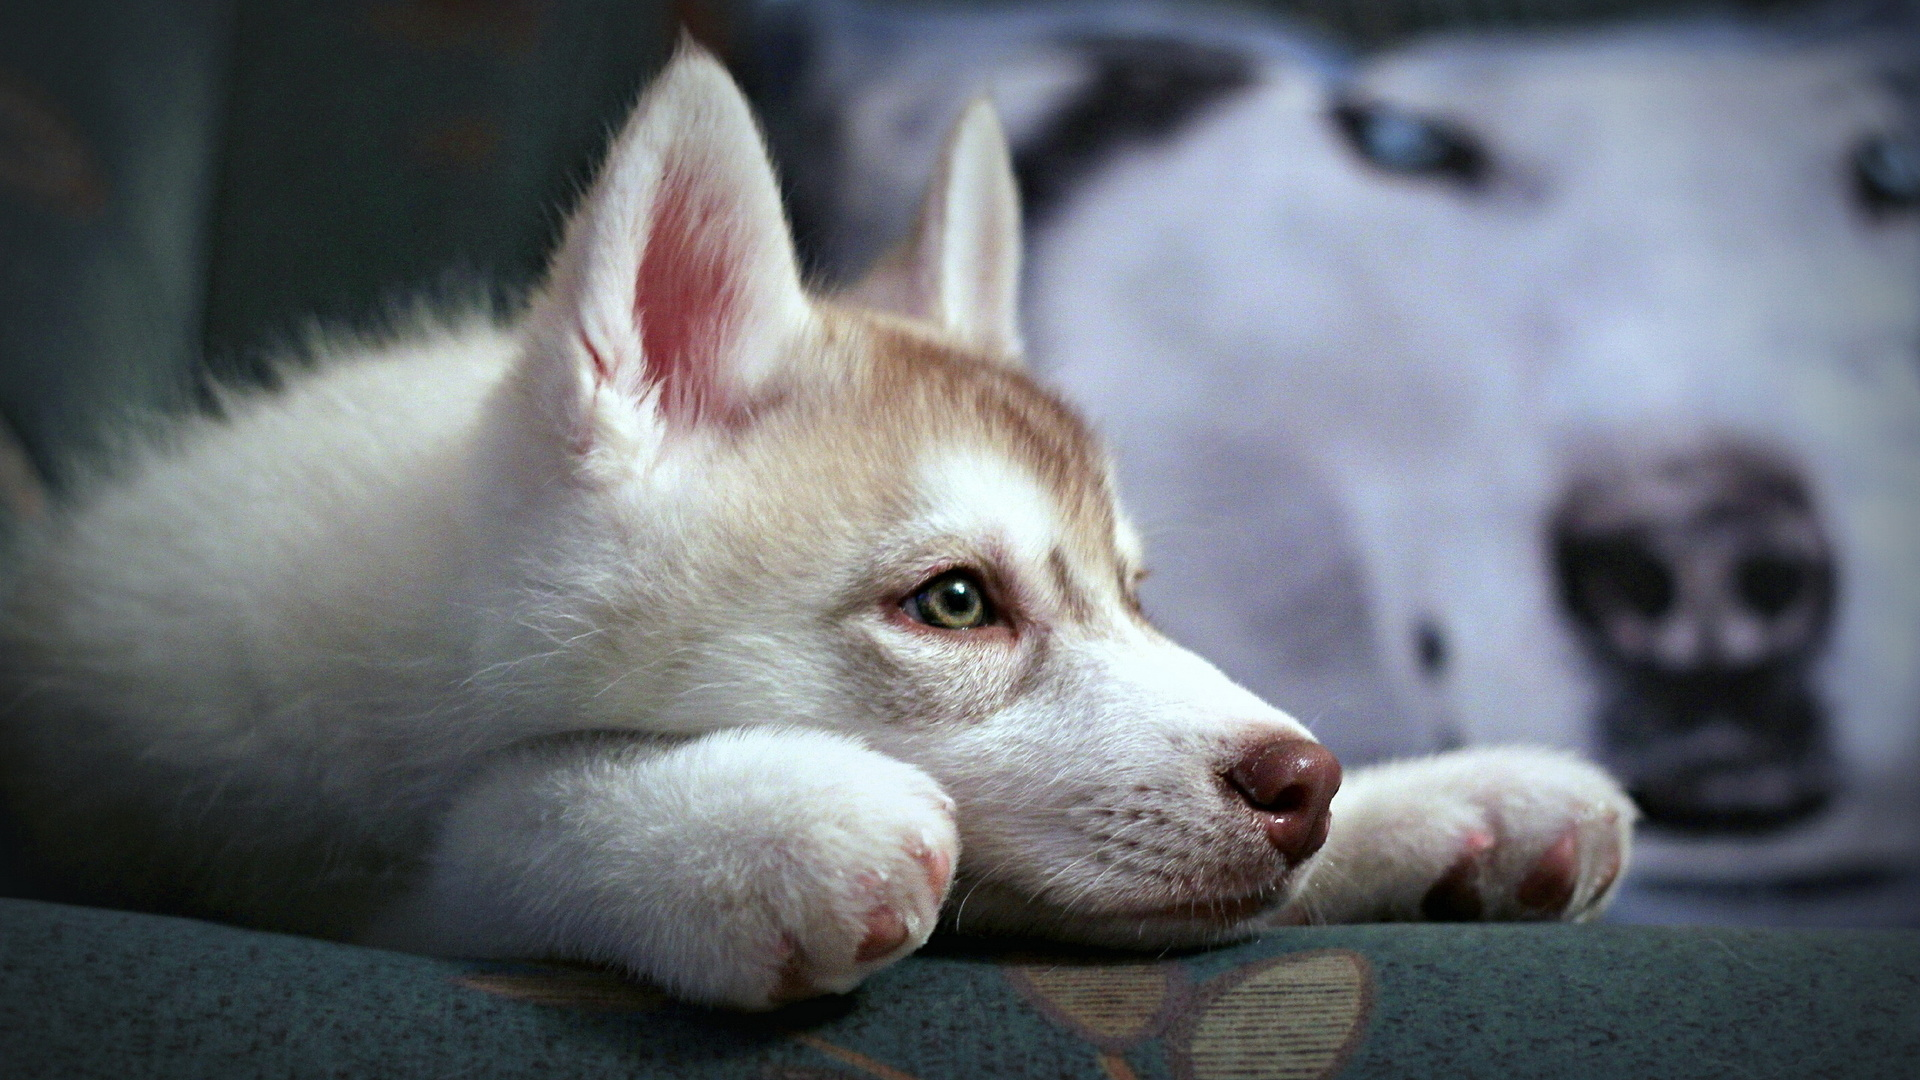 животное, собака, щенок, хаски, морда, лапы